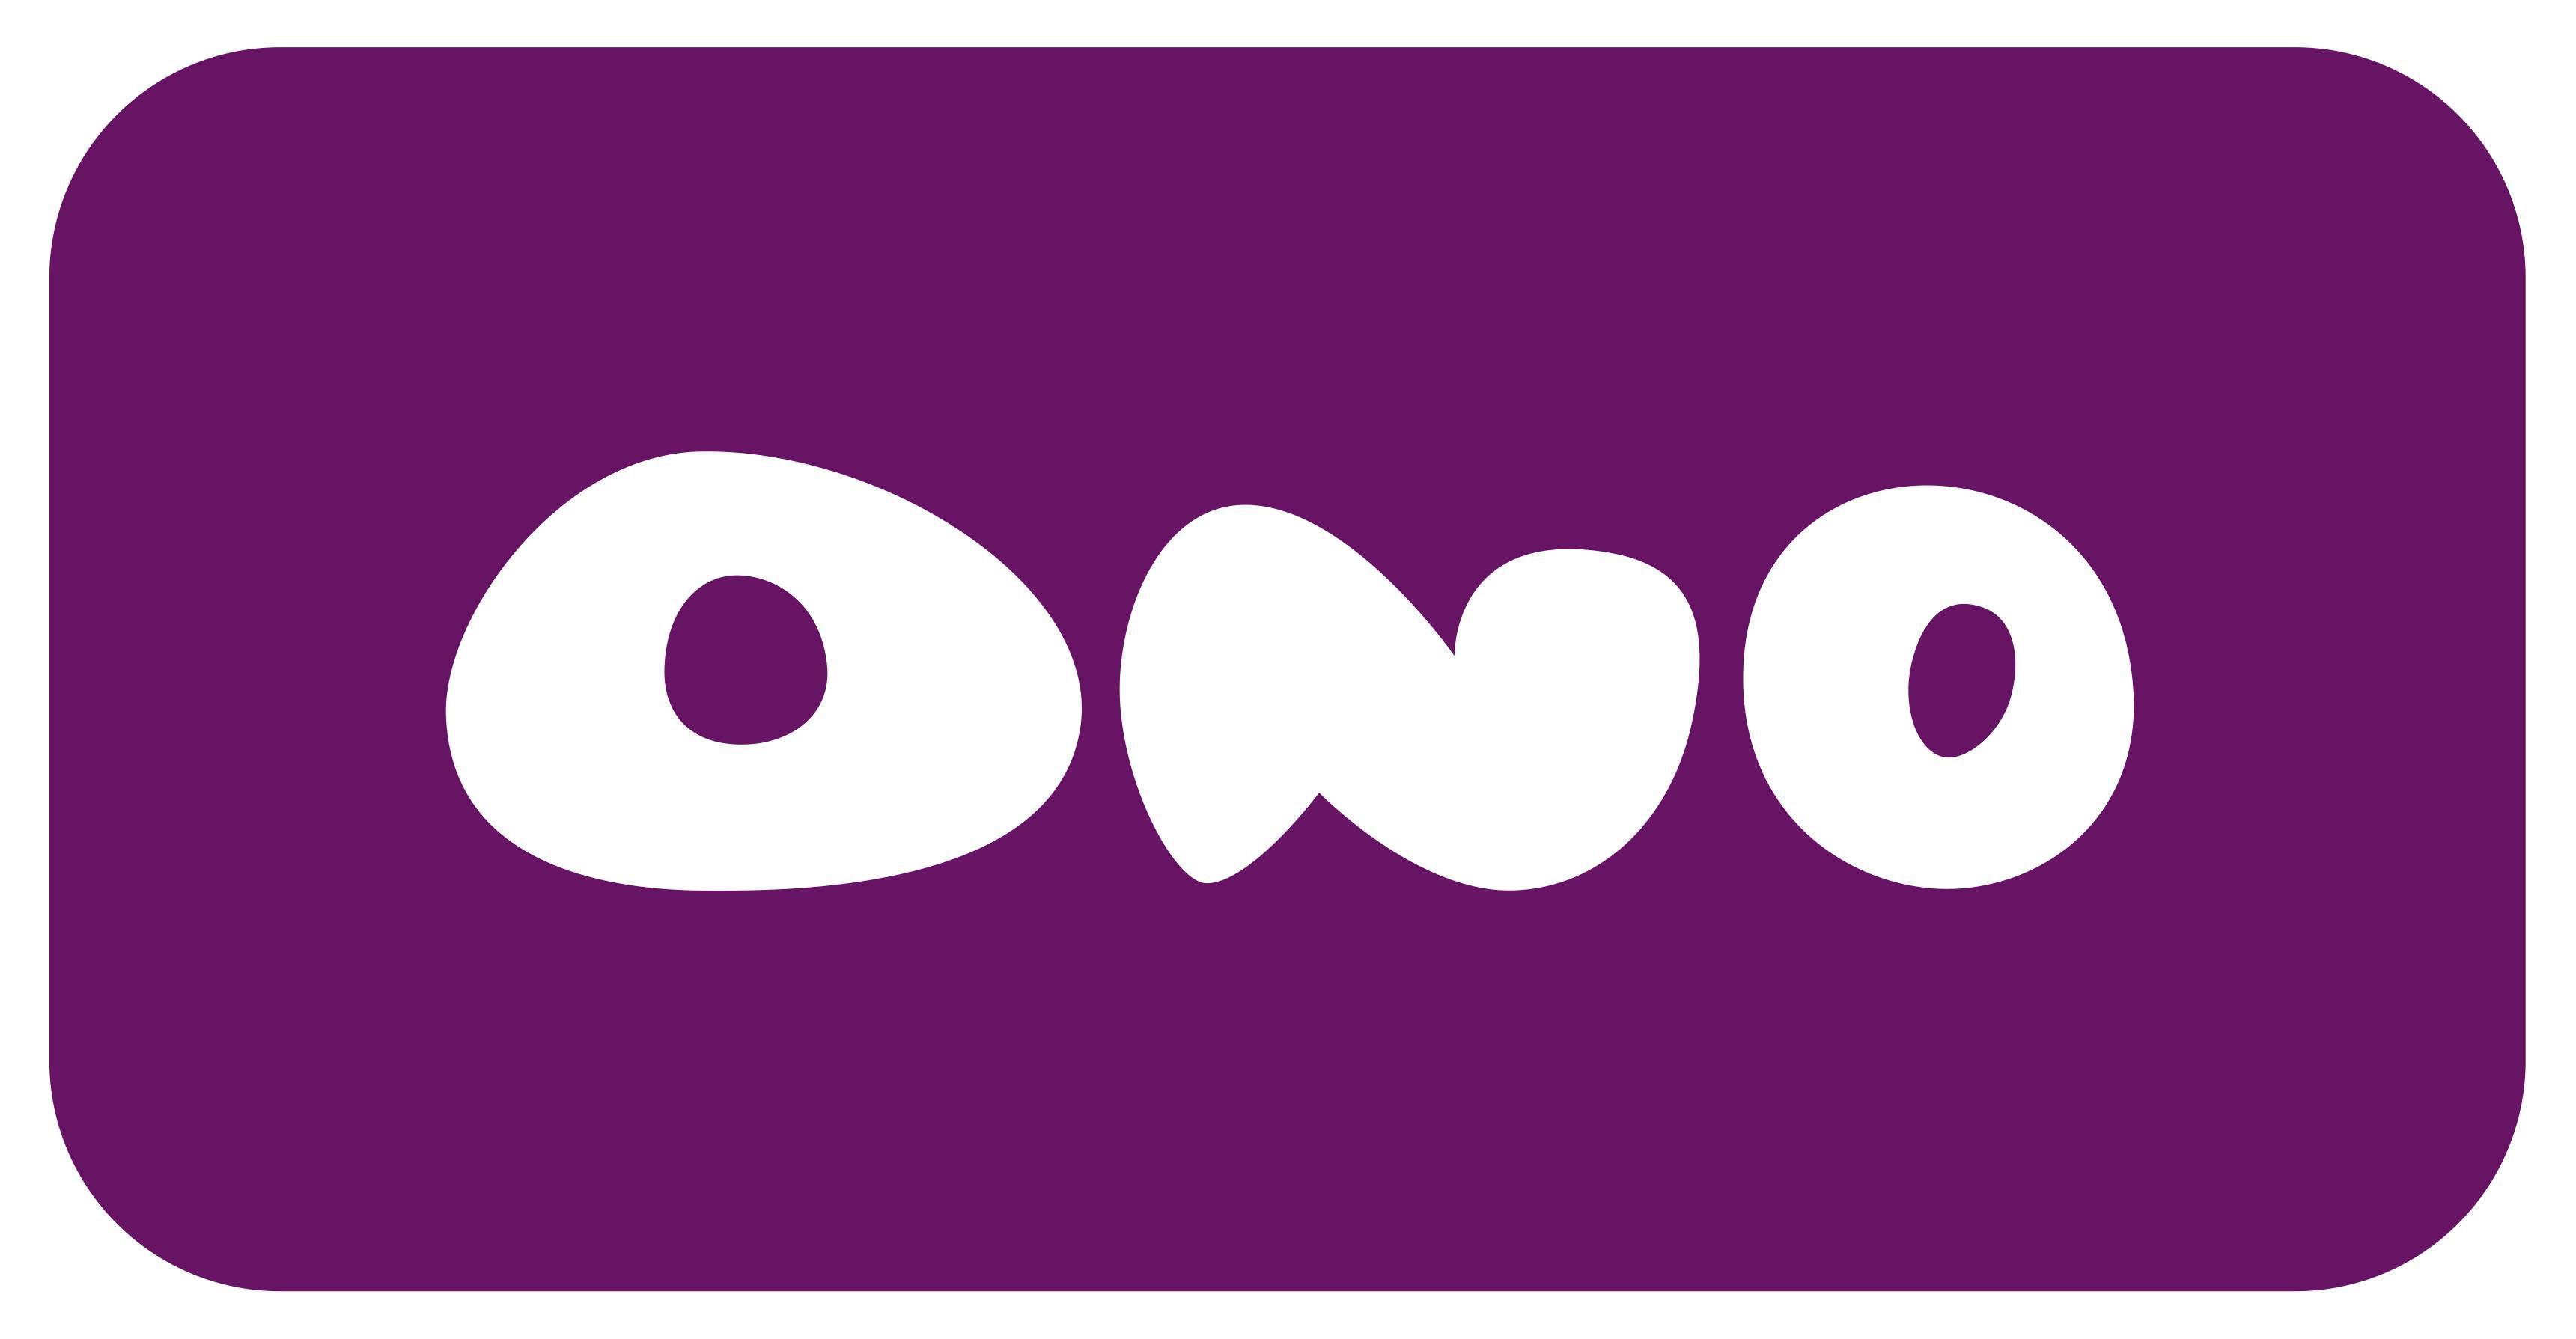 Ono ofertas de fibra ptica y m vil for Ono oficinas